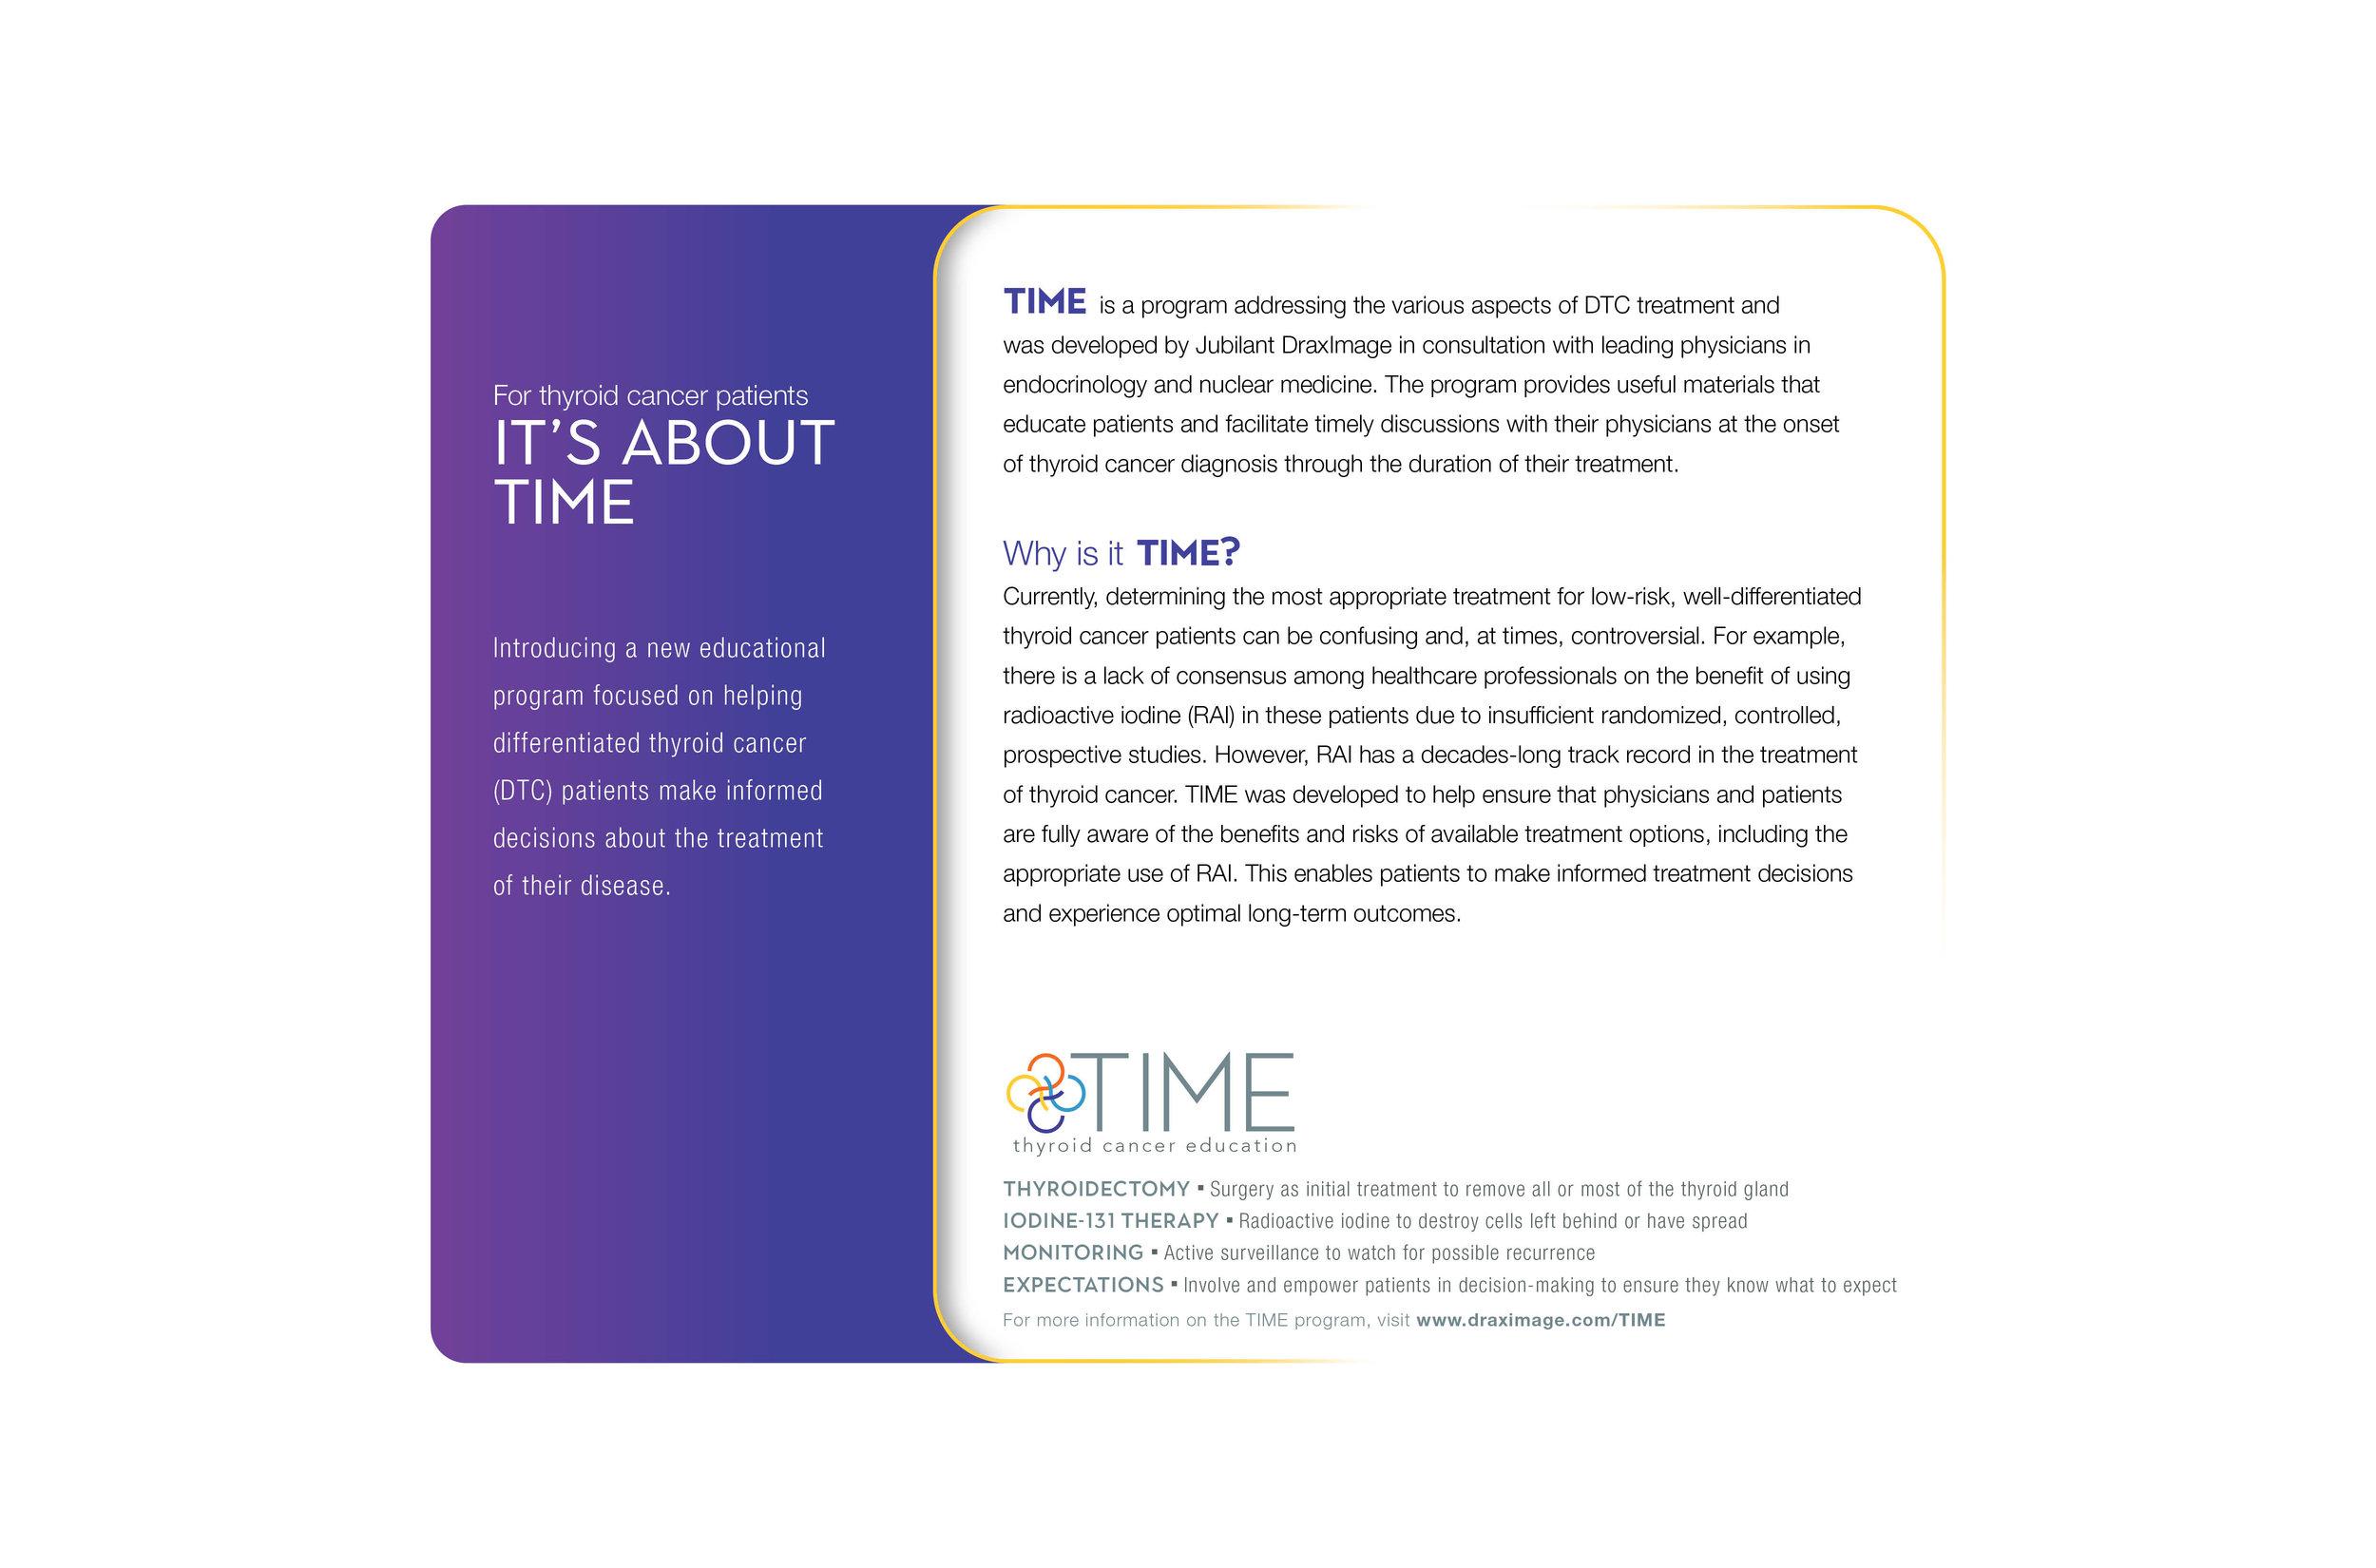 JDSI-1705 TIME Overview Sell Sheet_L10.jpg